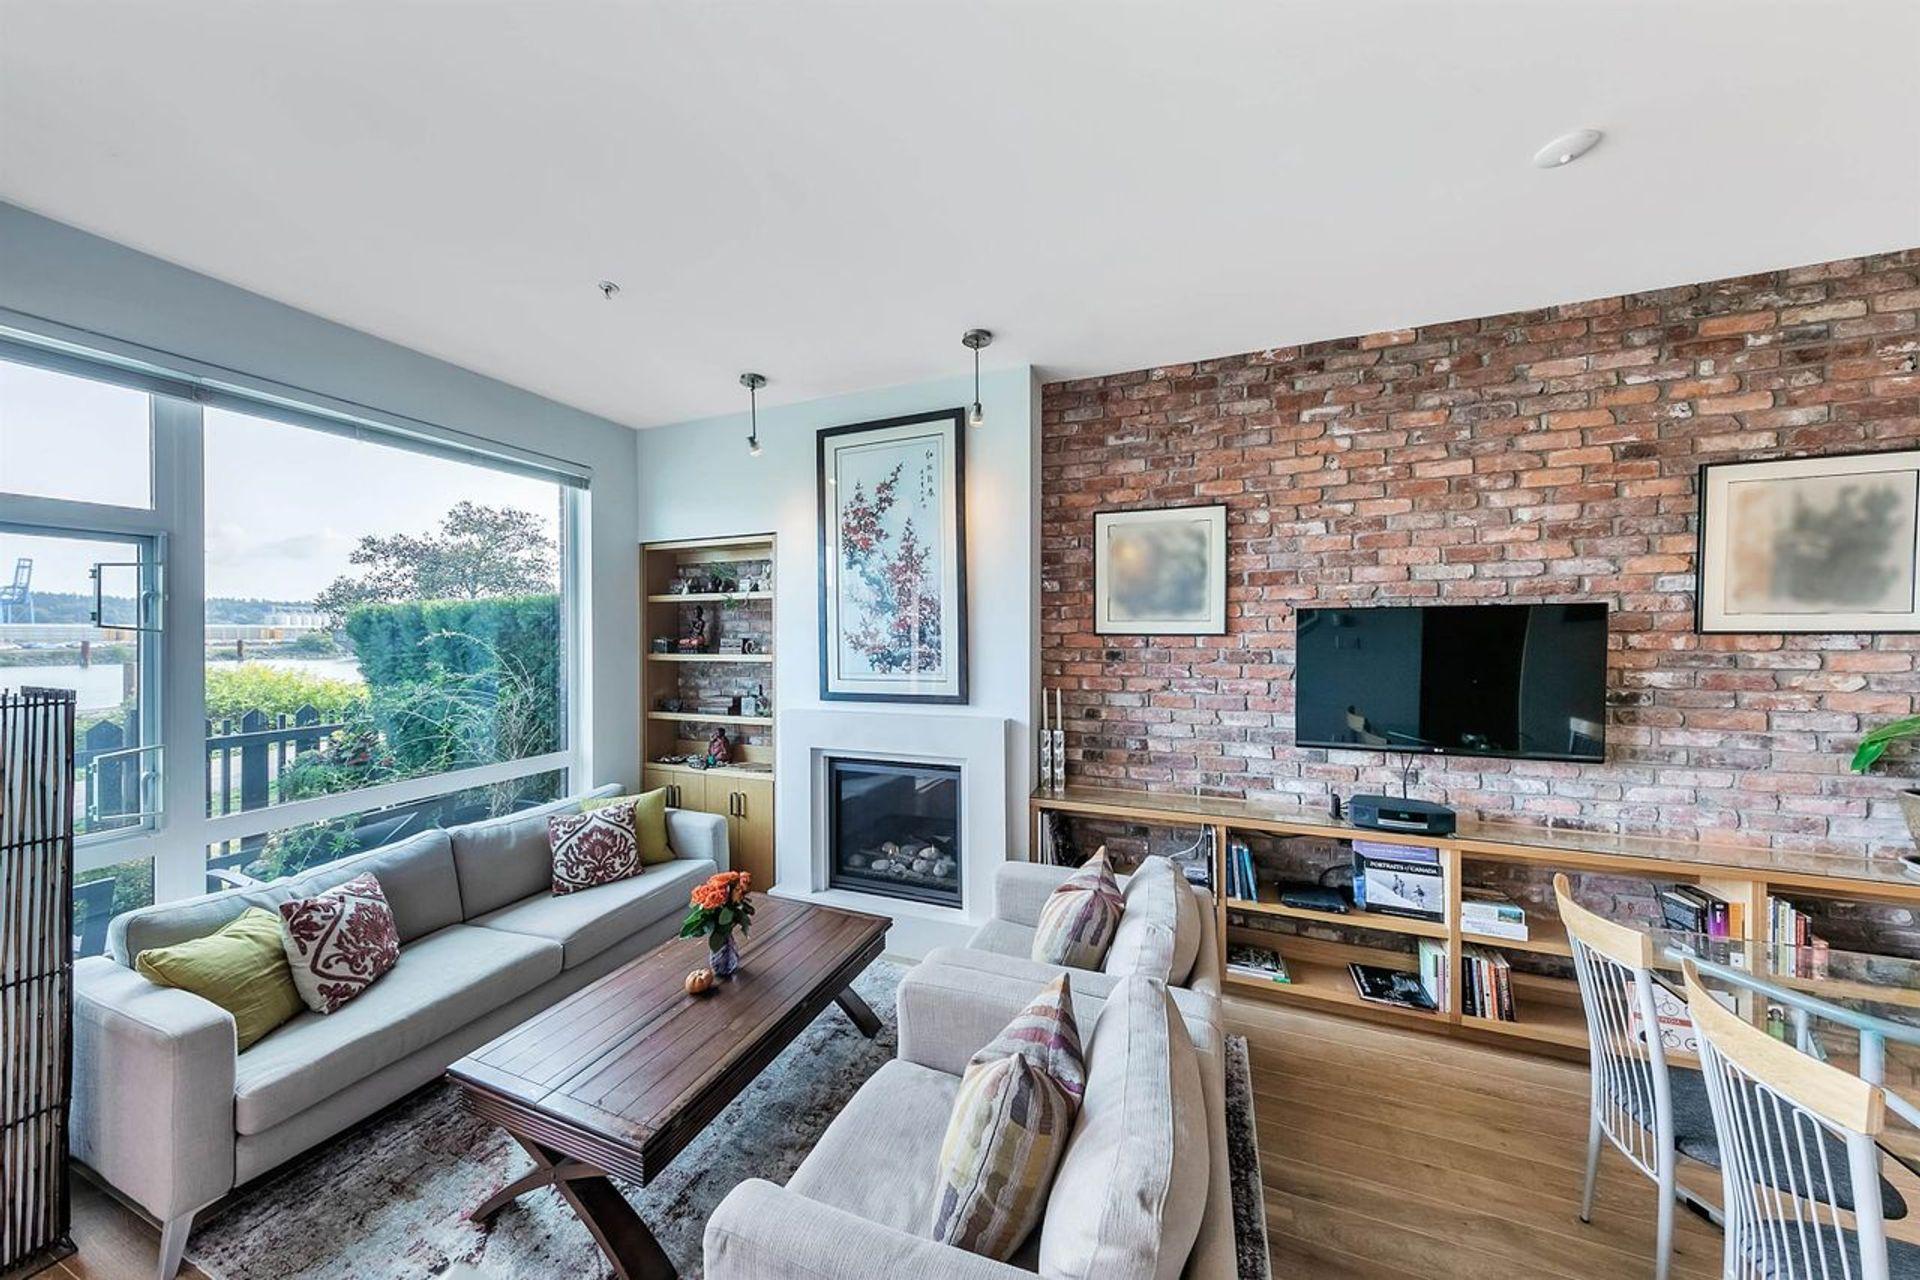 230-salter-street-queensborough-new-westminster-01 at 24 - 230 Salter Street, Queensborough, New Westminster